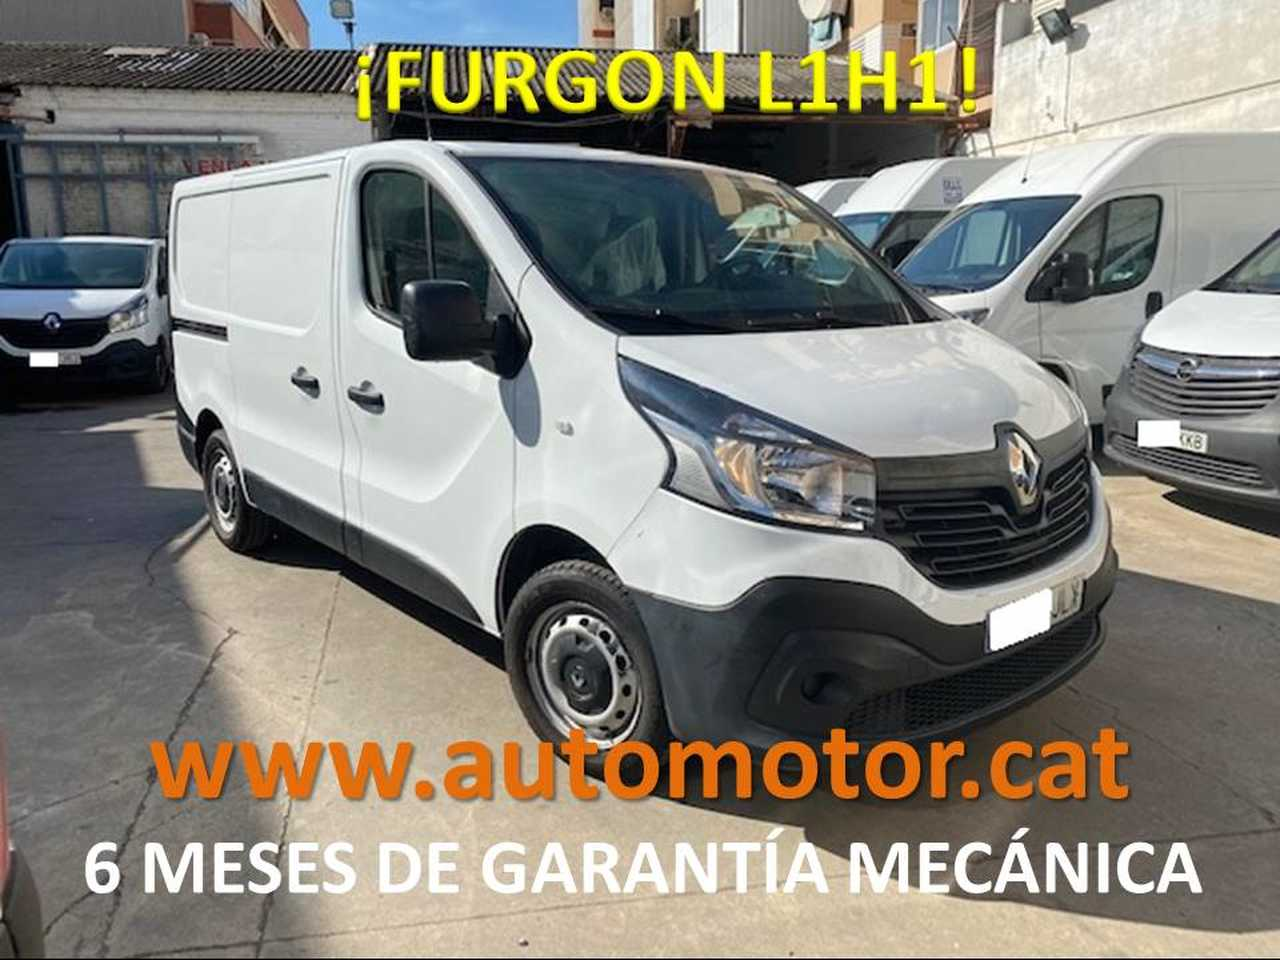 Renault Trafic Furgón 27 L1H1 dCi - GARANTIA MECANICA  - Foto 1